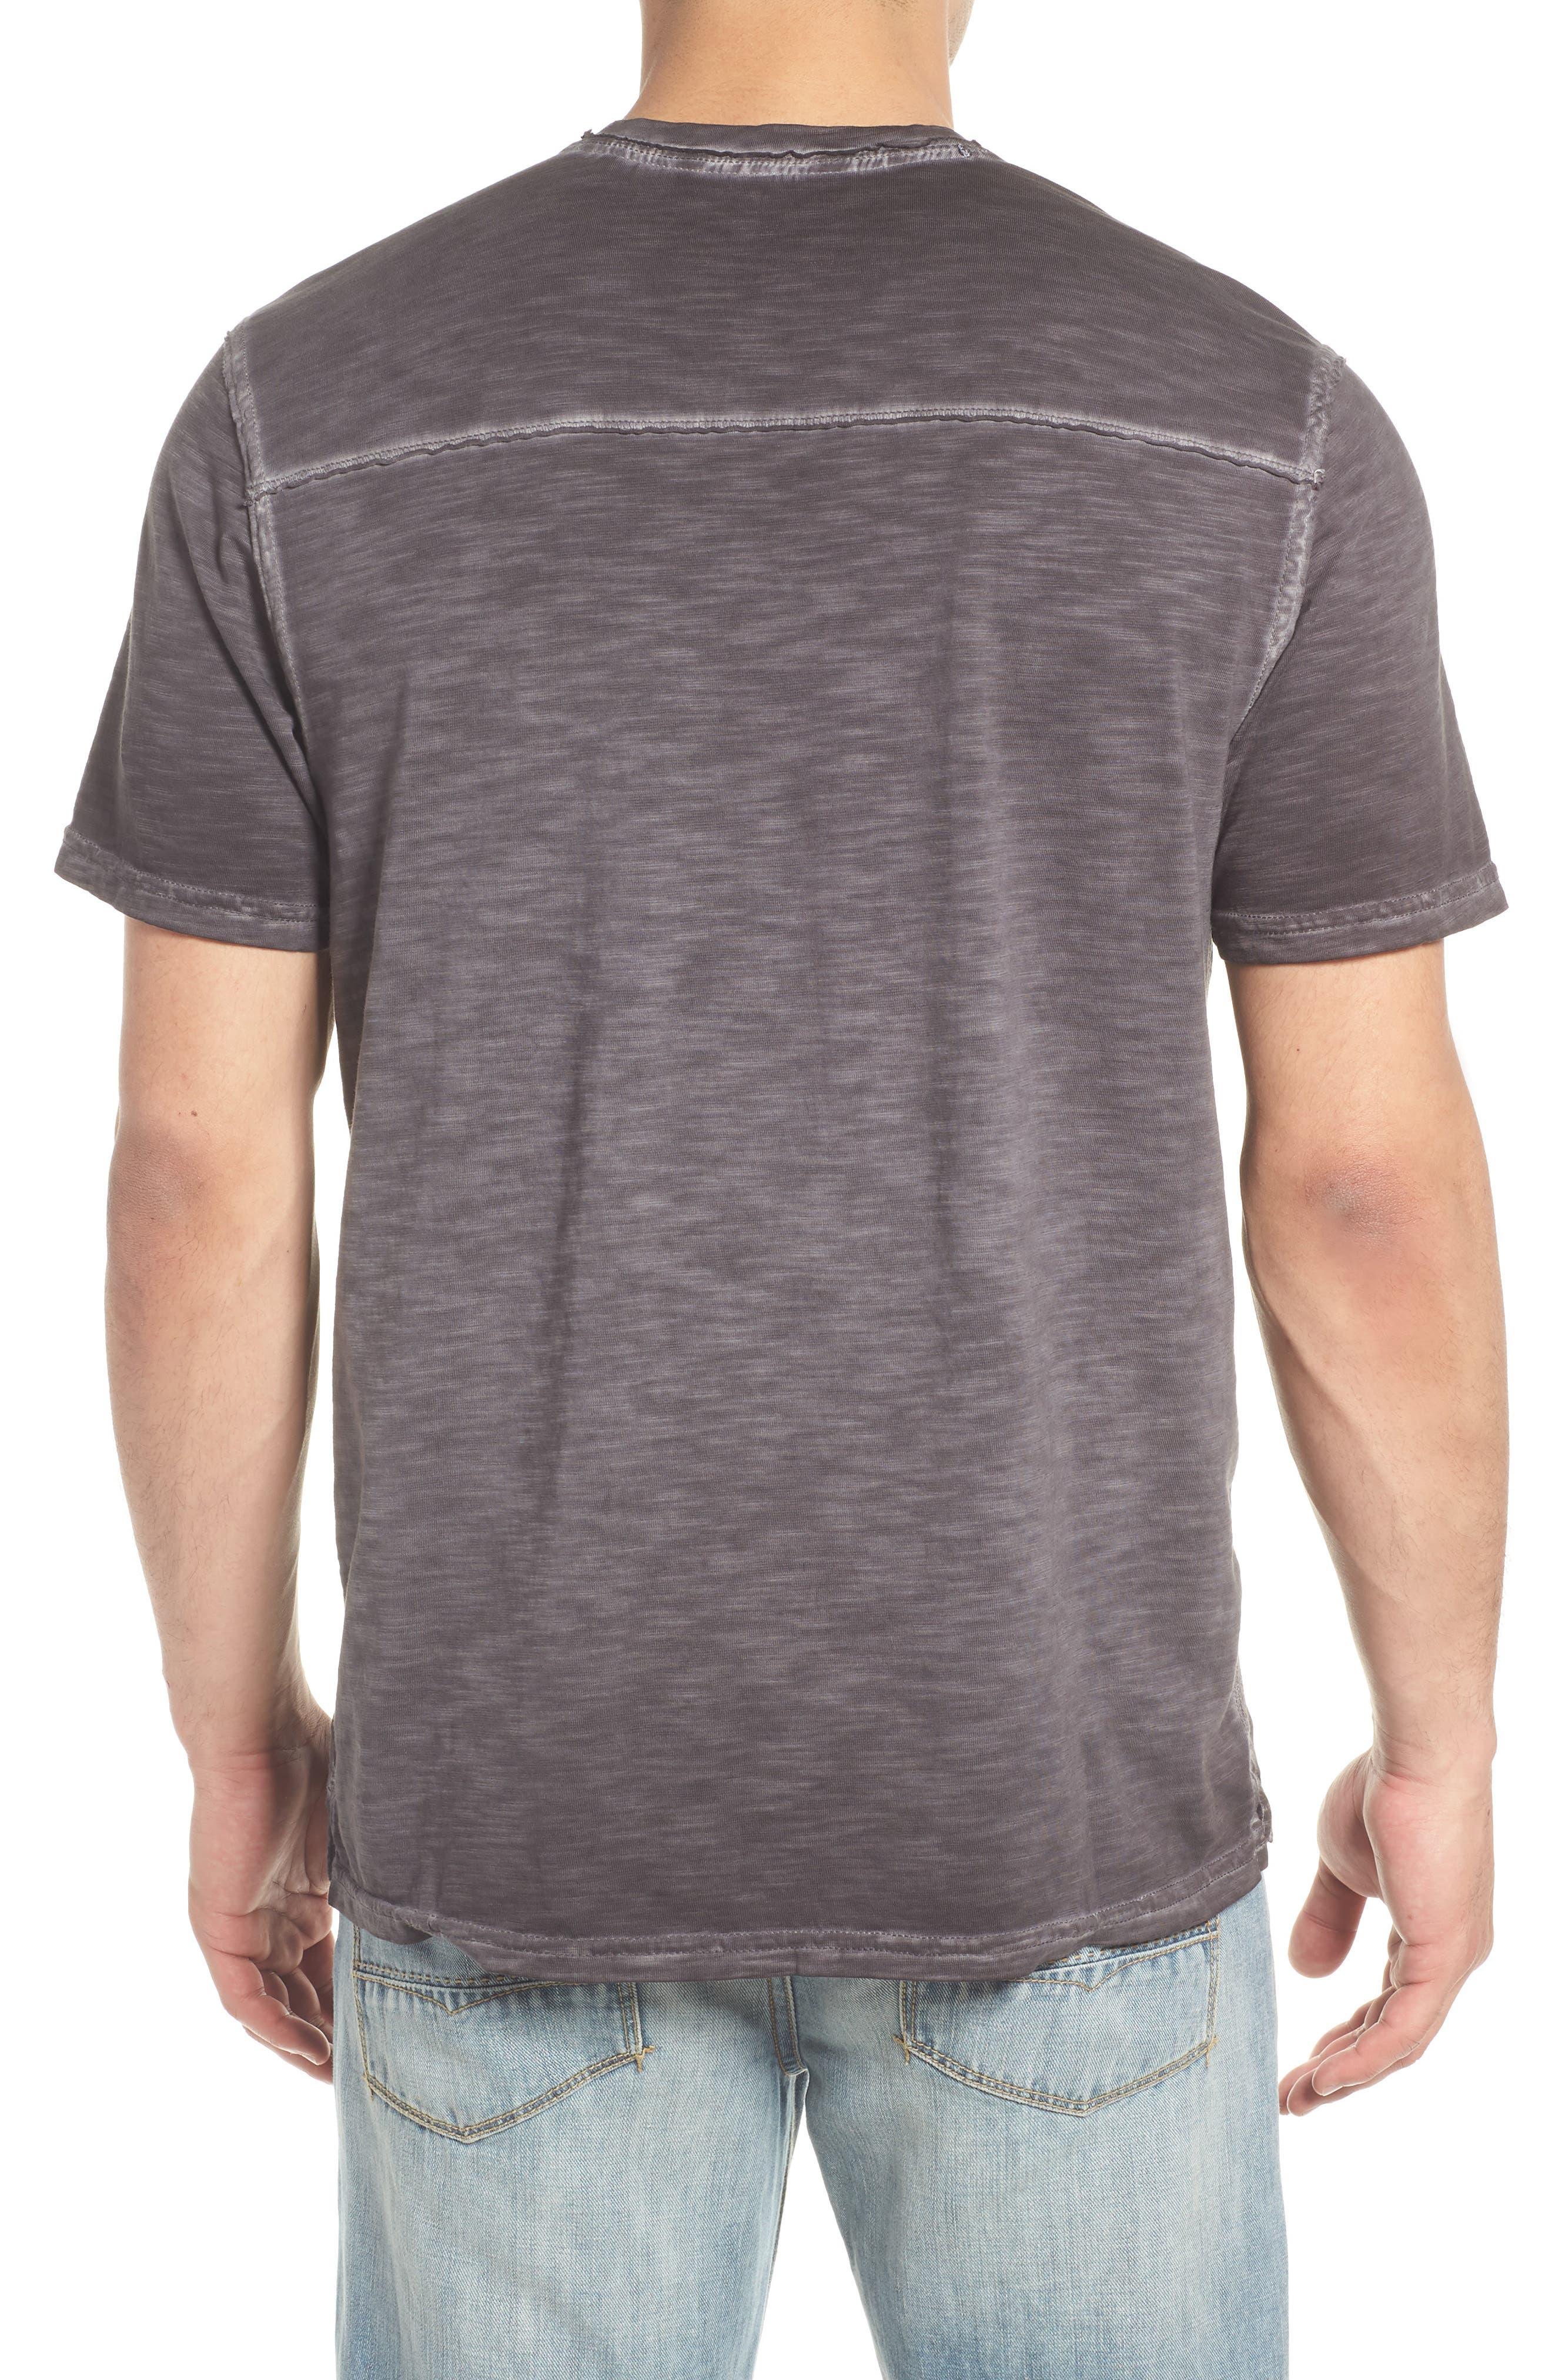 Suncoast Shores V-Neck T-Shirt,                             Alternate thumbnail 2, color,                             COAL